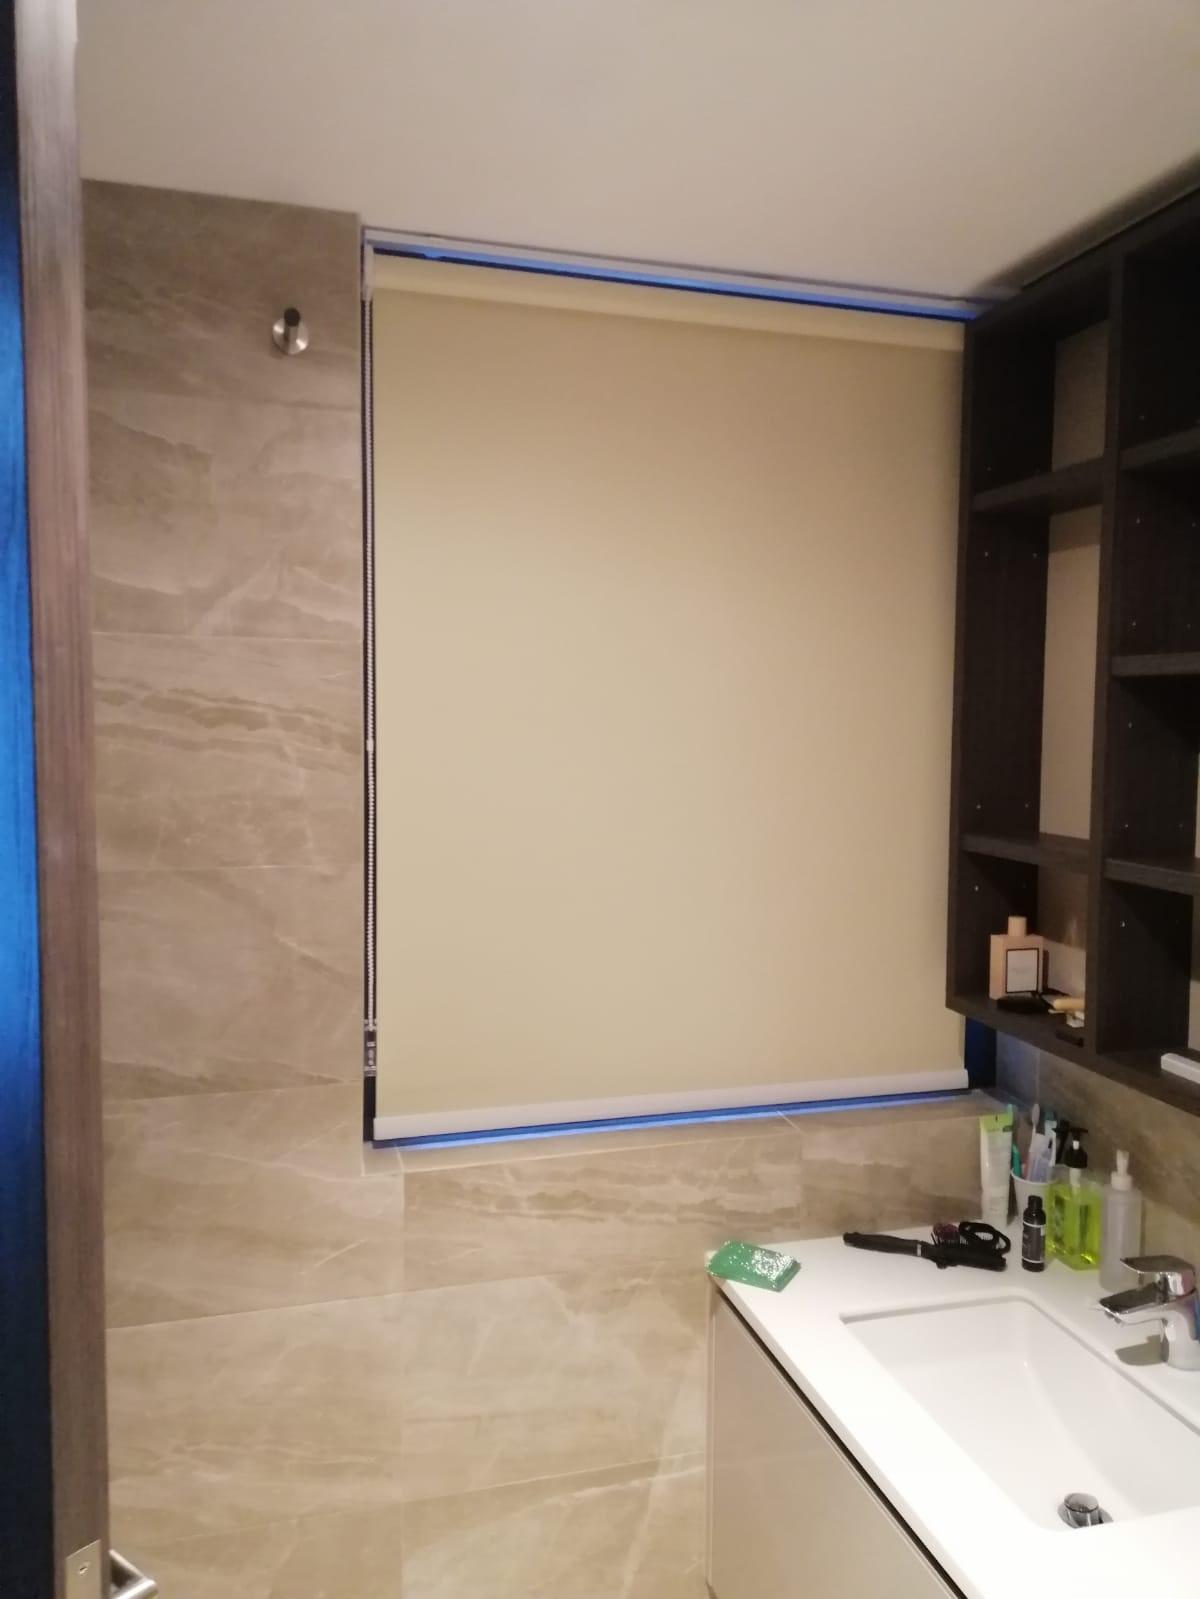 Bathroom Roller Blinds Installation Curtains House Singapore Condo – Tanjong Pagar